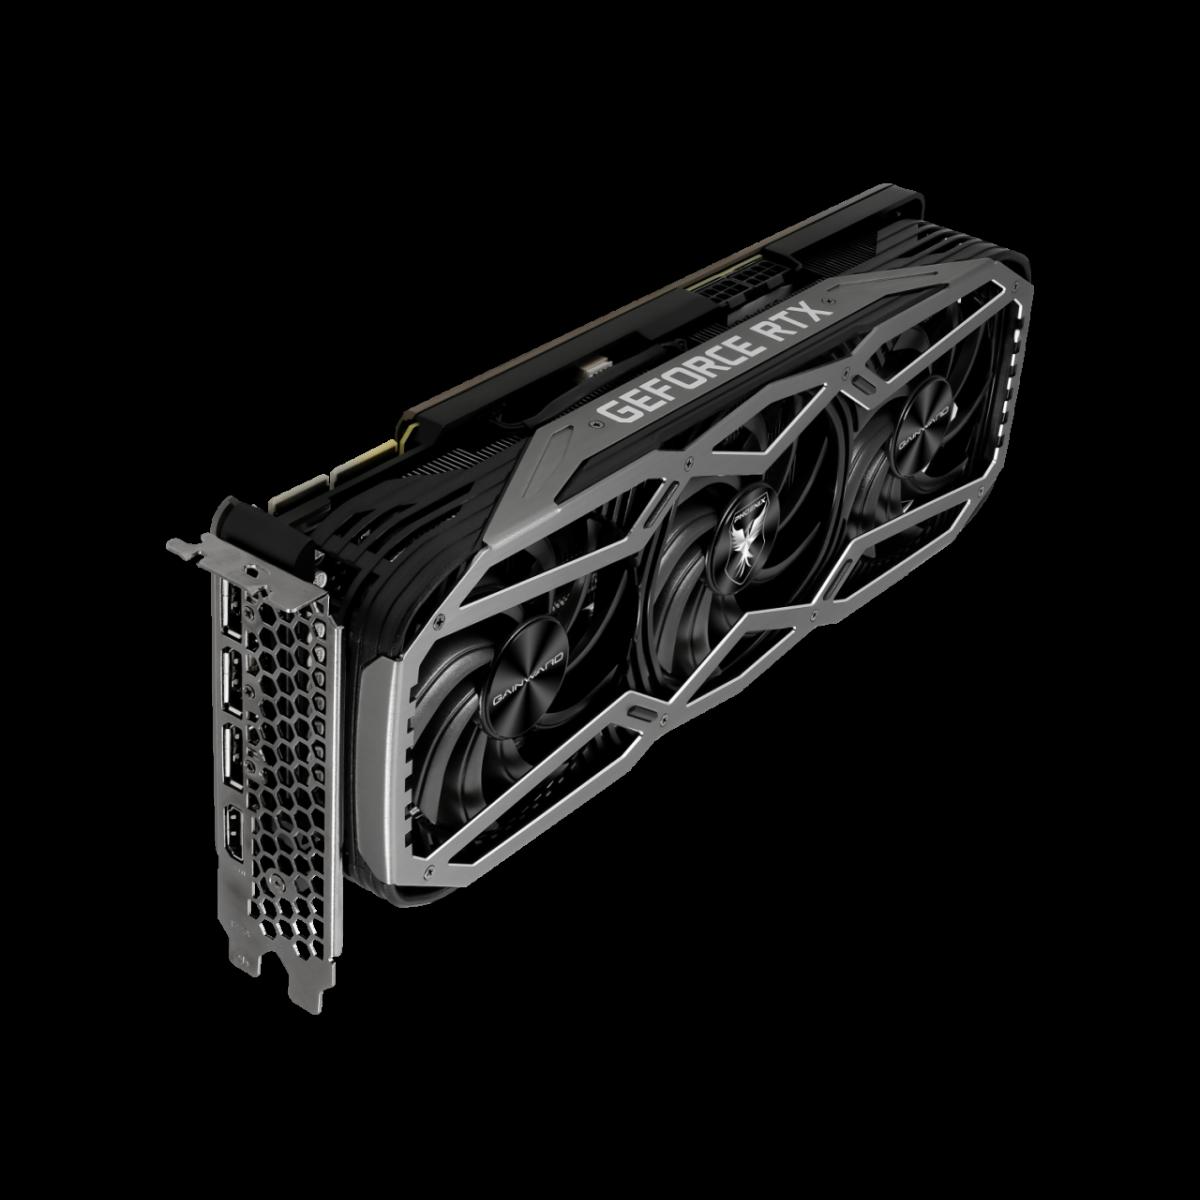 Placa de Vídeo Gainward, GeForce RTX 3080 Phoenix, 10GB, GDDR6, 320Bit, NED3080019IA-132AX